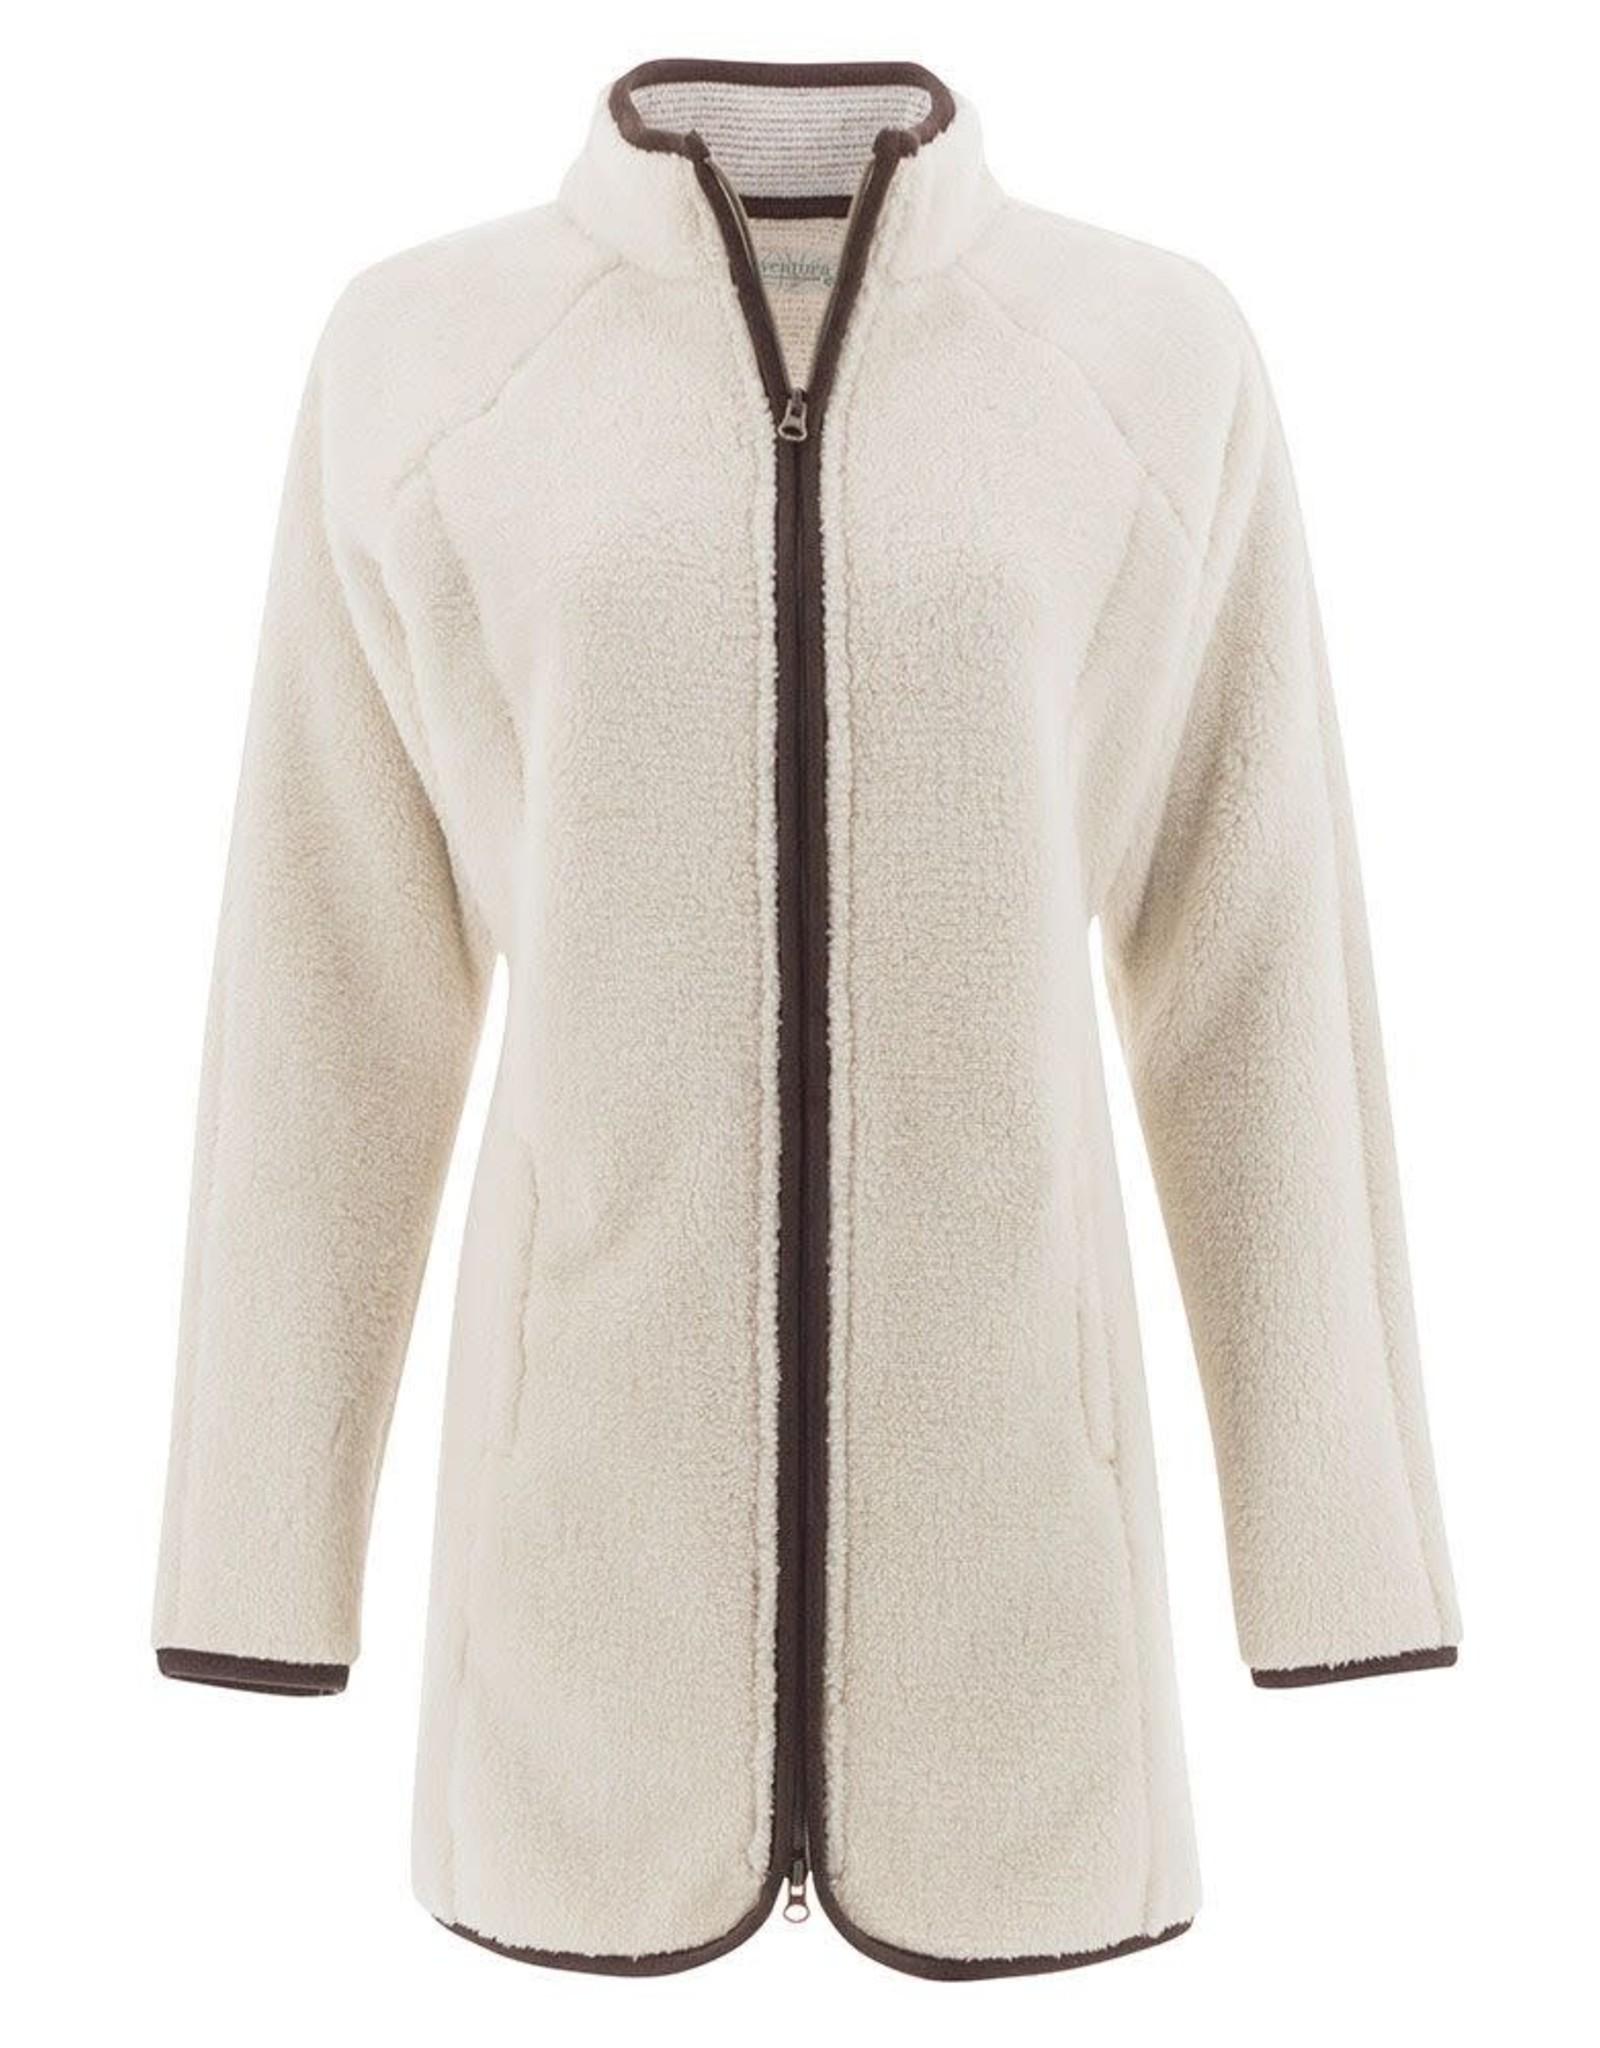 Aventura 30% off FINAL SALE- Tamsin Jacket- White